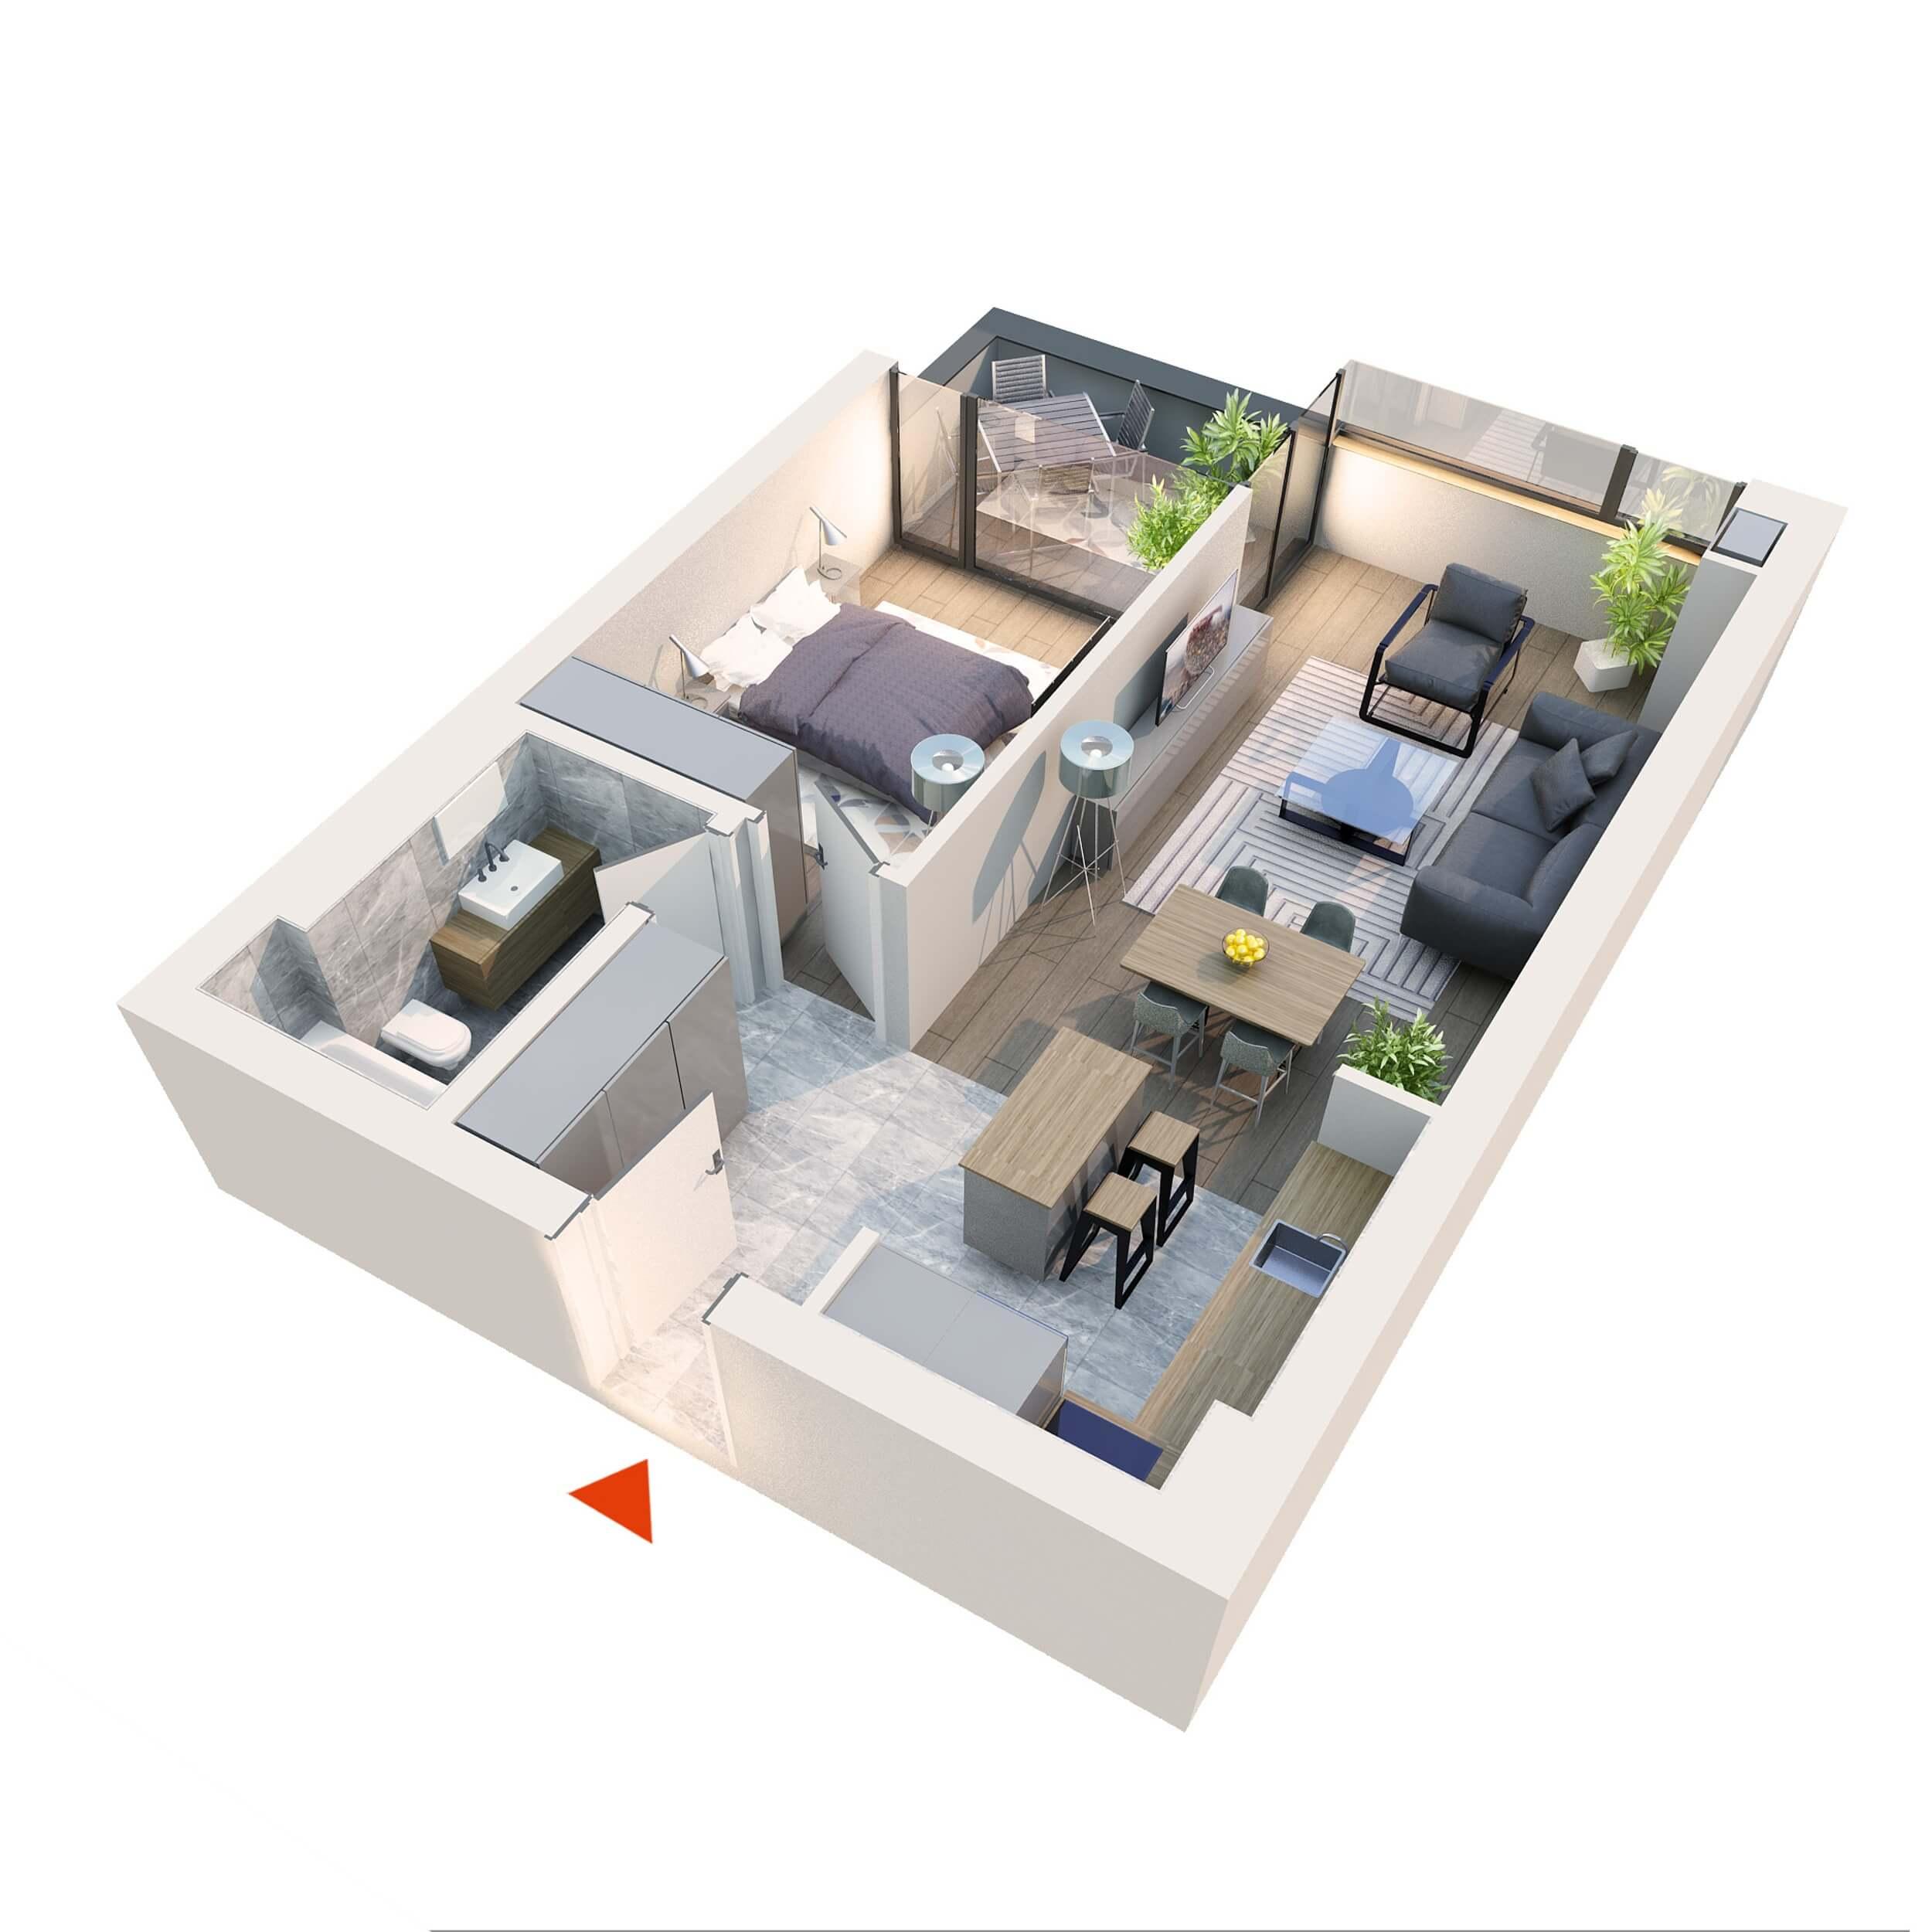 "Apartament 2 camere tip 2D1.1"" Logie | Etaj 1-3 | Corp C7 | Faza 2"